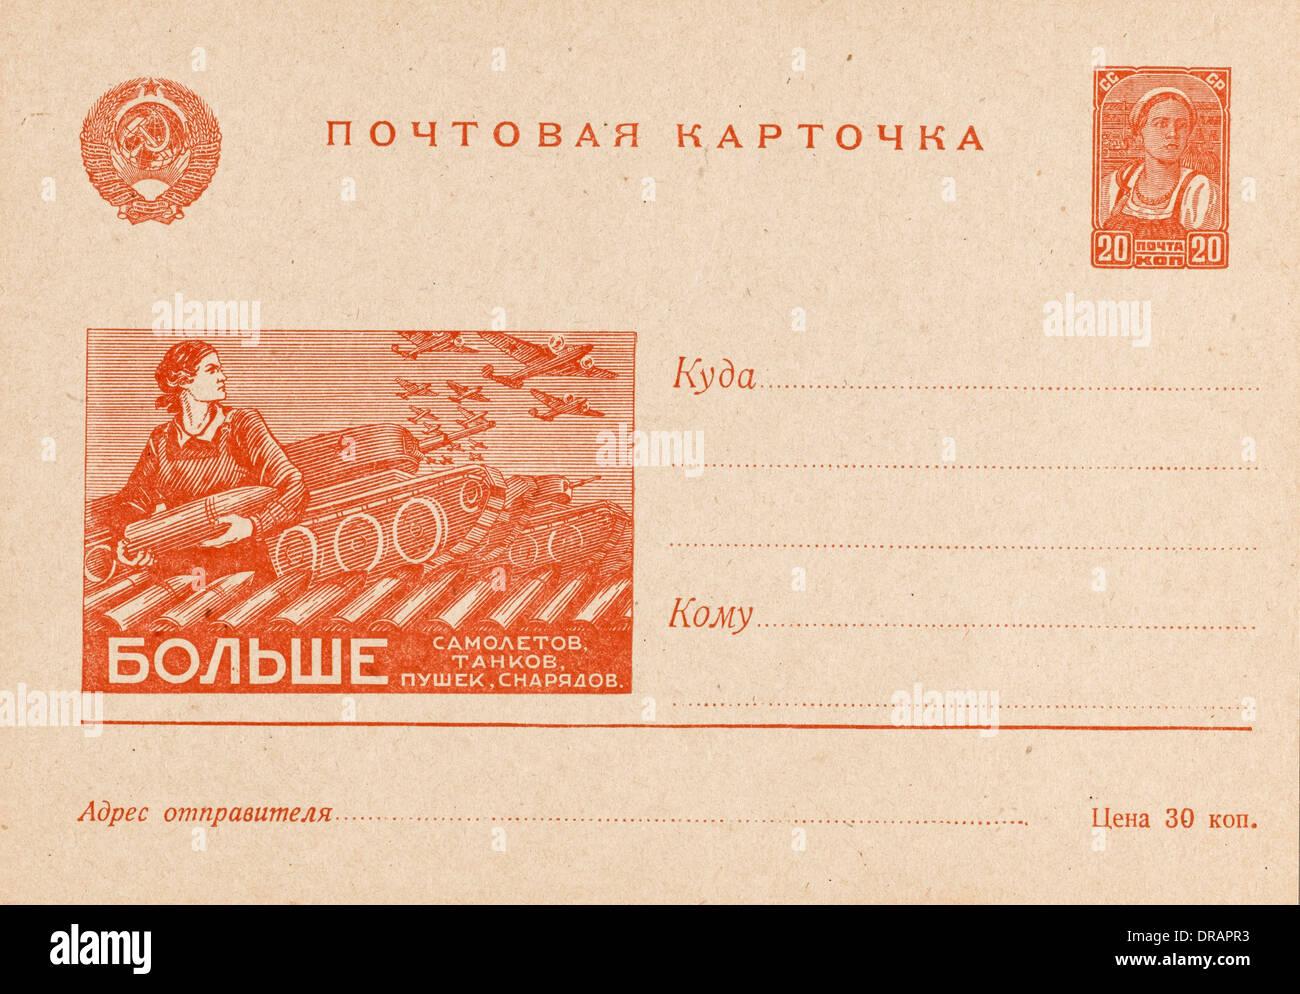 Soviet war propaganda - Stock Image